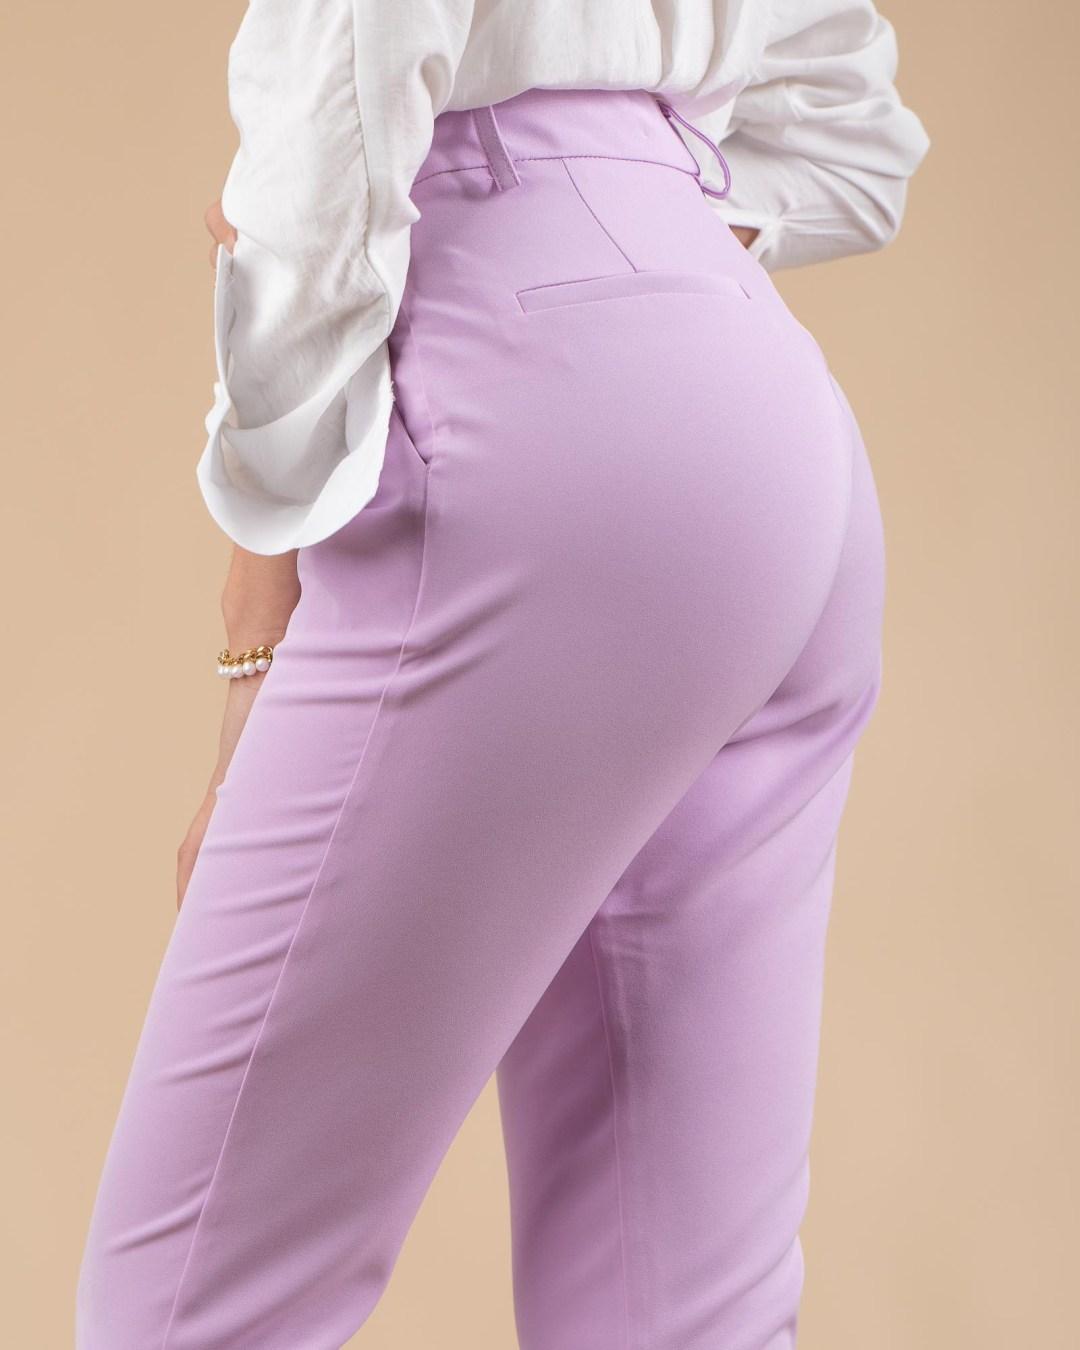 Pantalon tailleur taille haute lilas